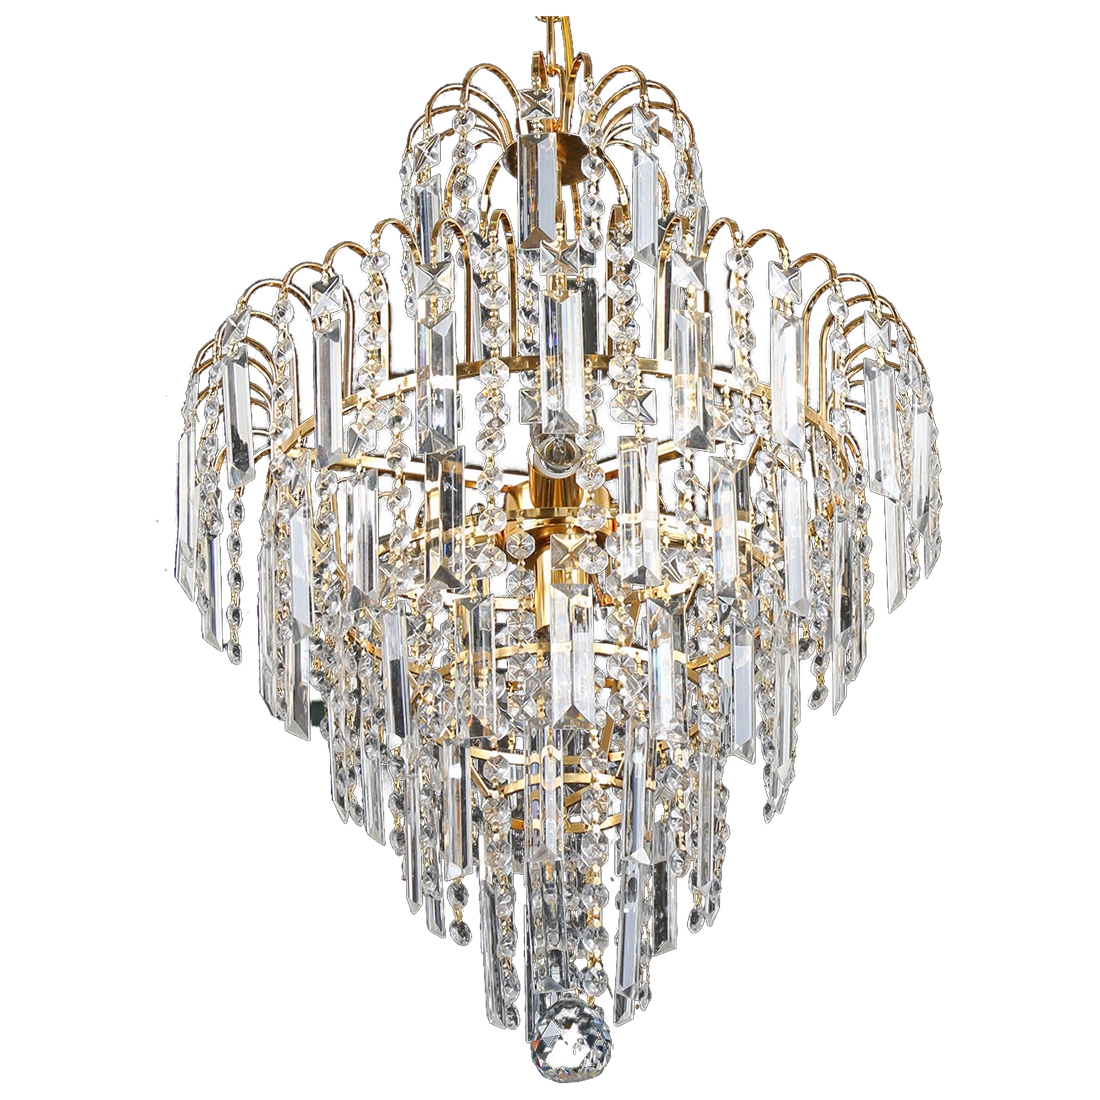 CSS Luxury Big Crystal Chandelier Modern Ceiling Light Lamp Lighting Fixture luxury big crystal modern ceiling light lamp lighting fixture